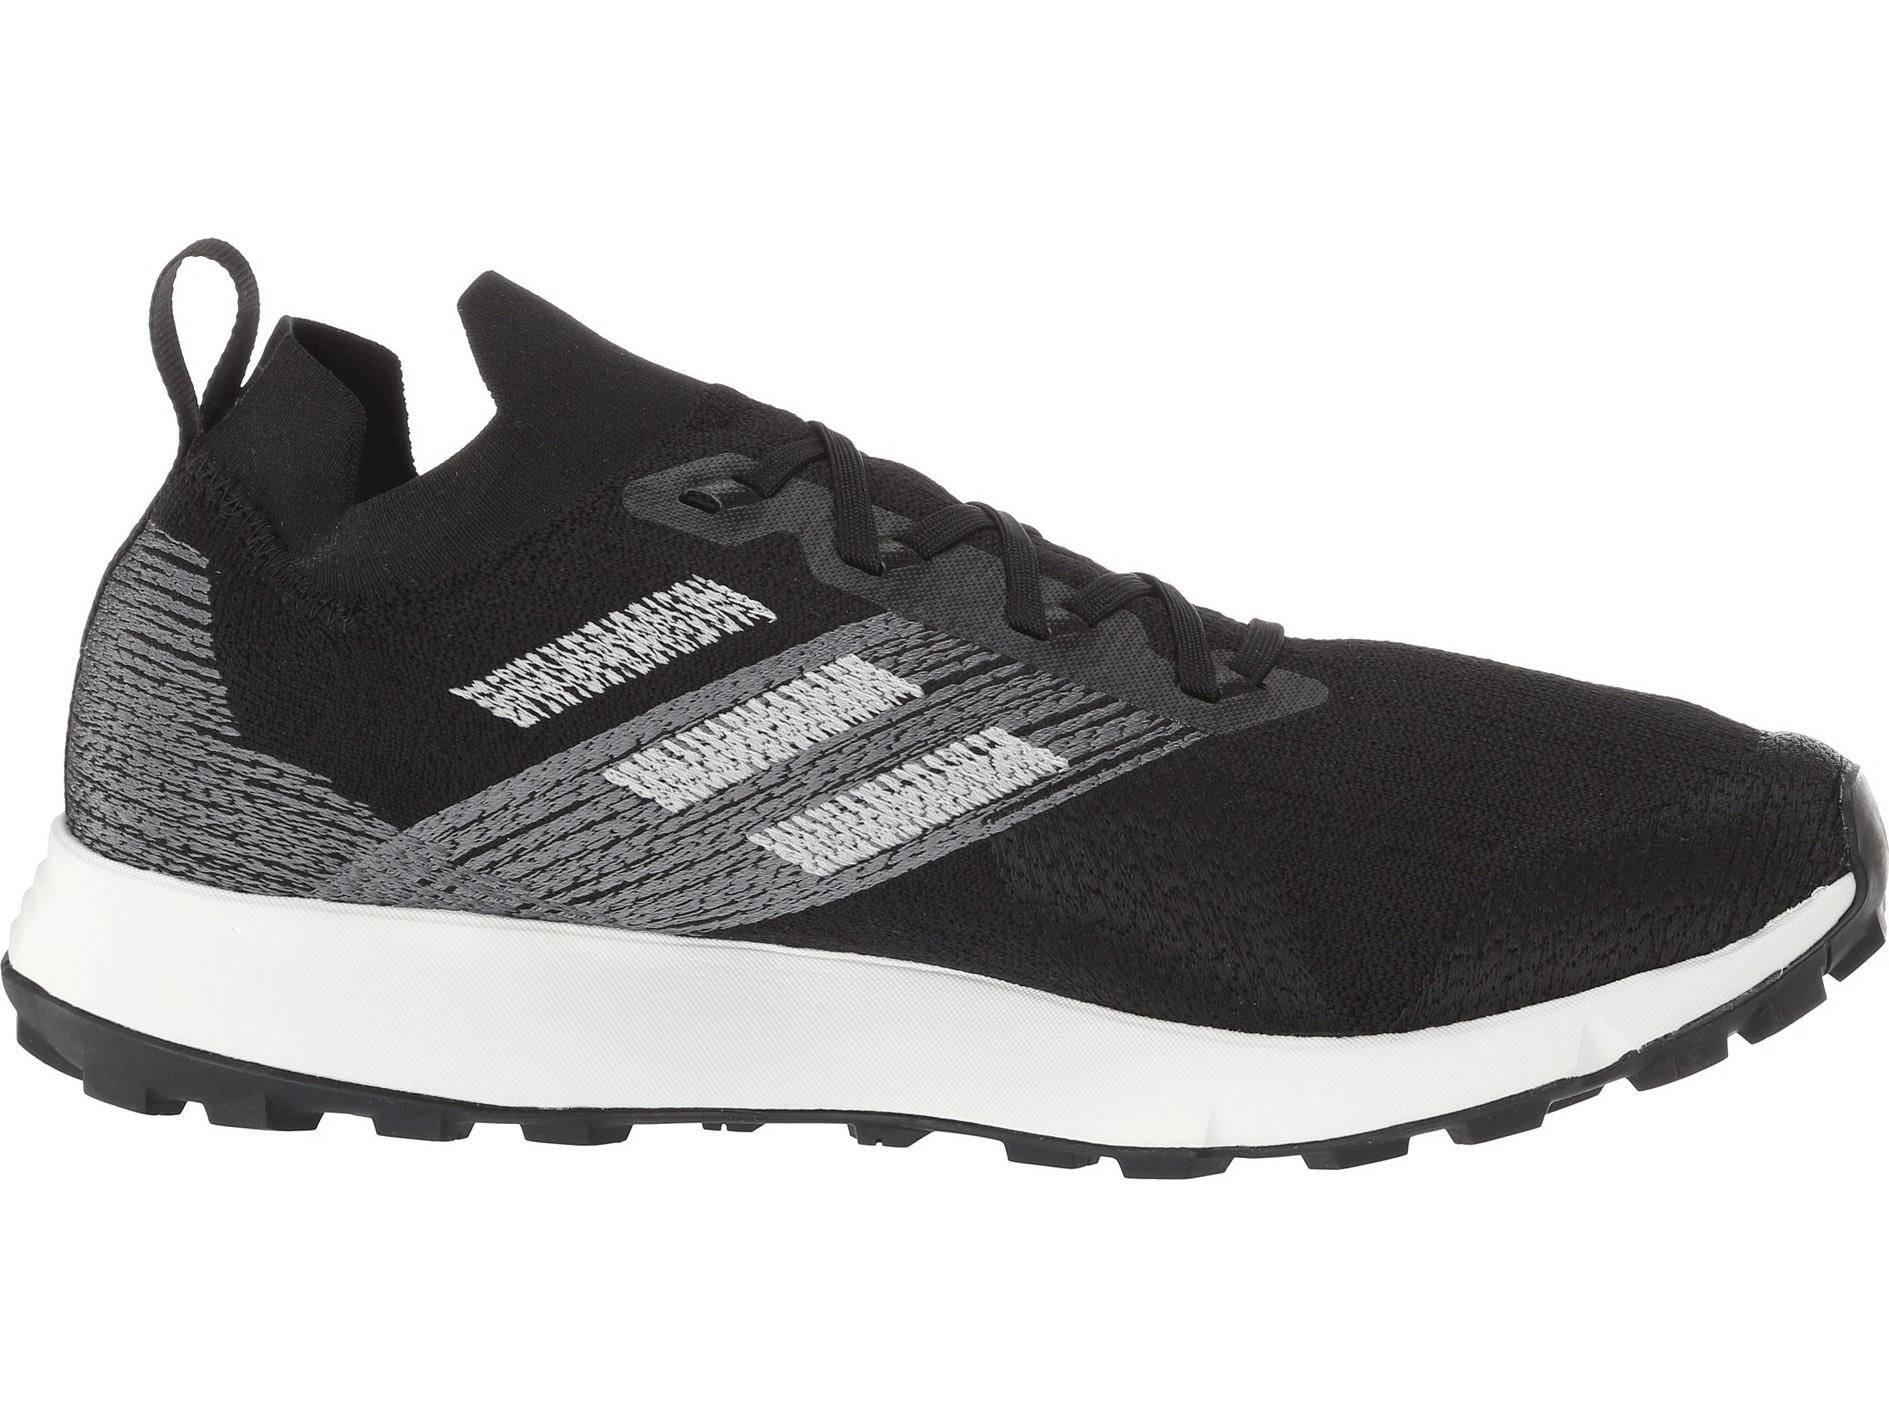 Adidas TERREX TWO PARLEY BLACK 11